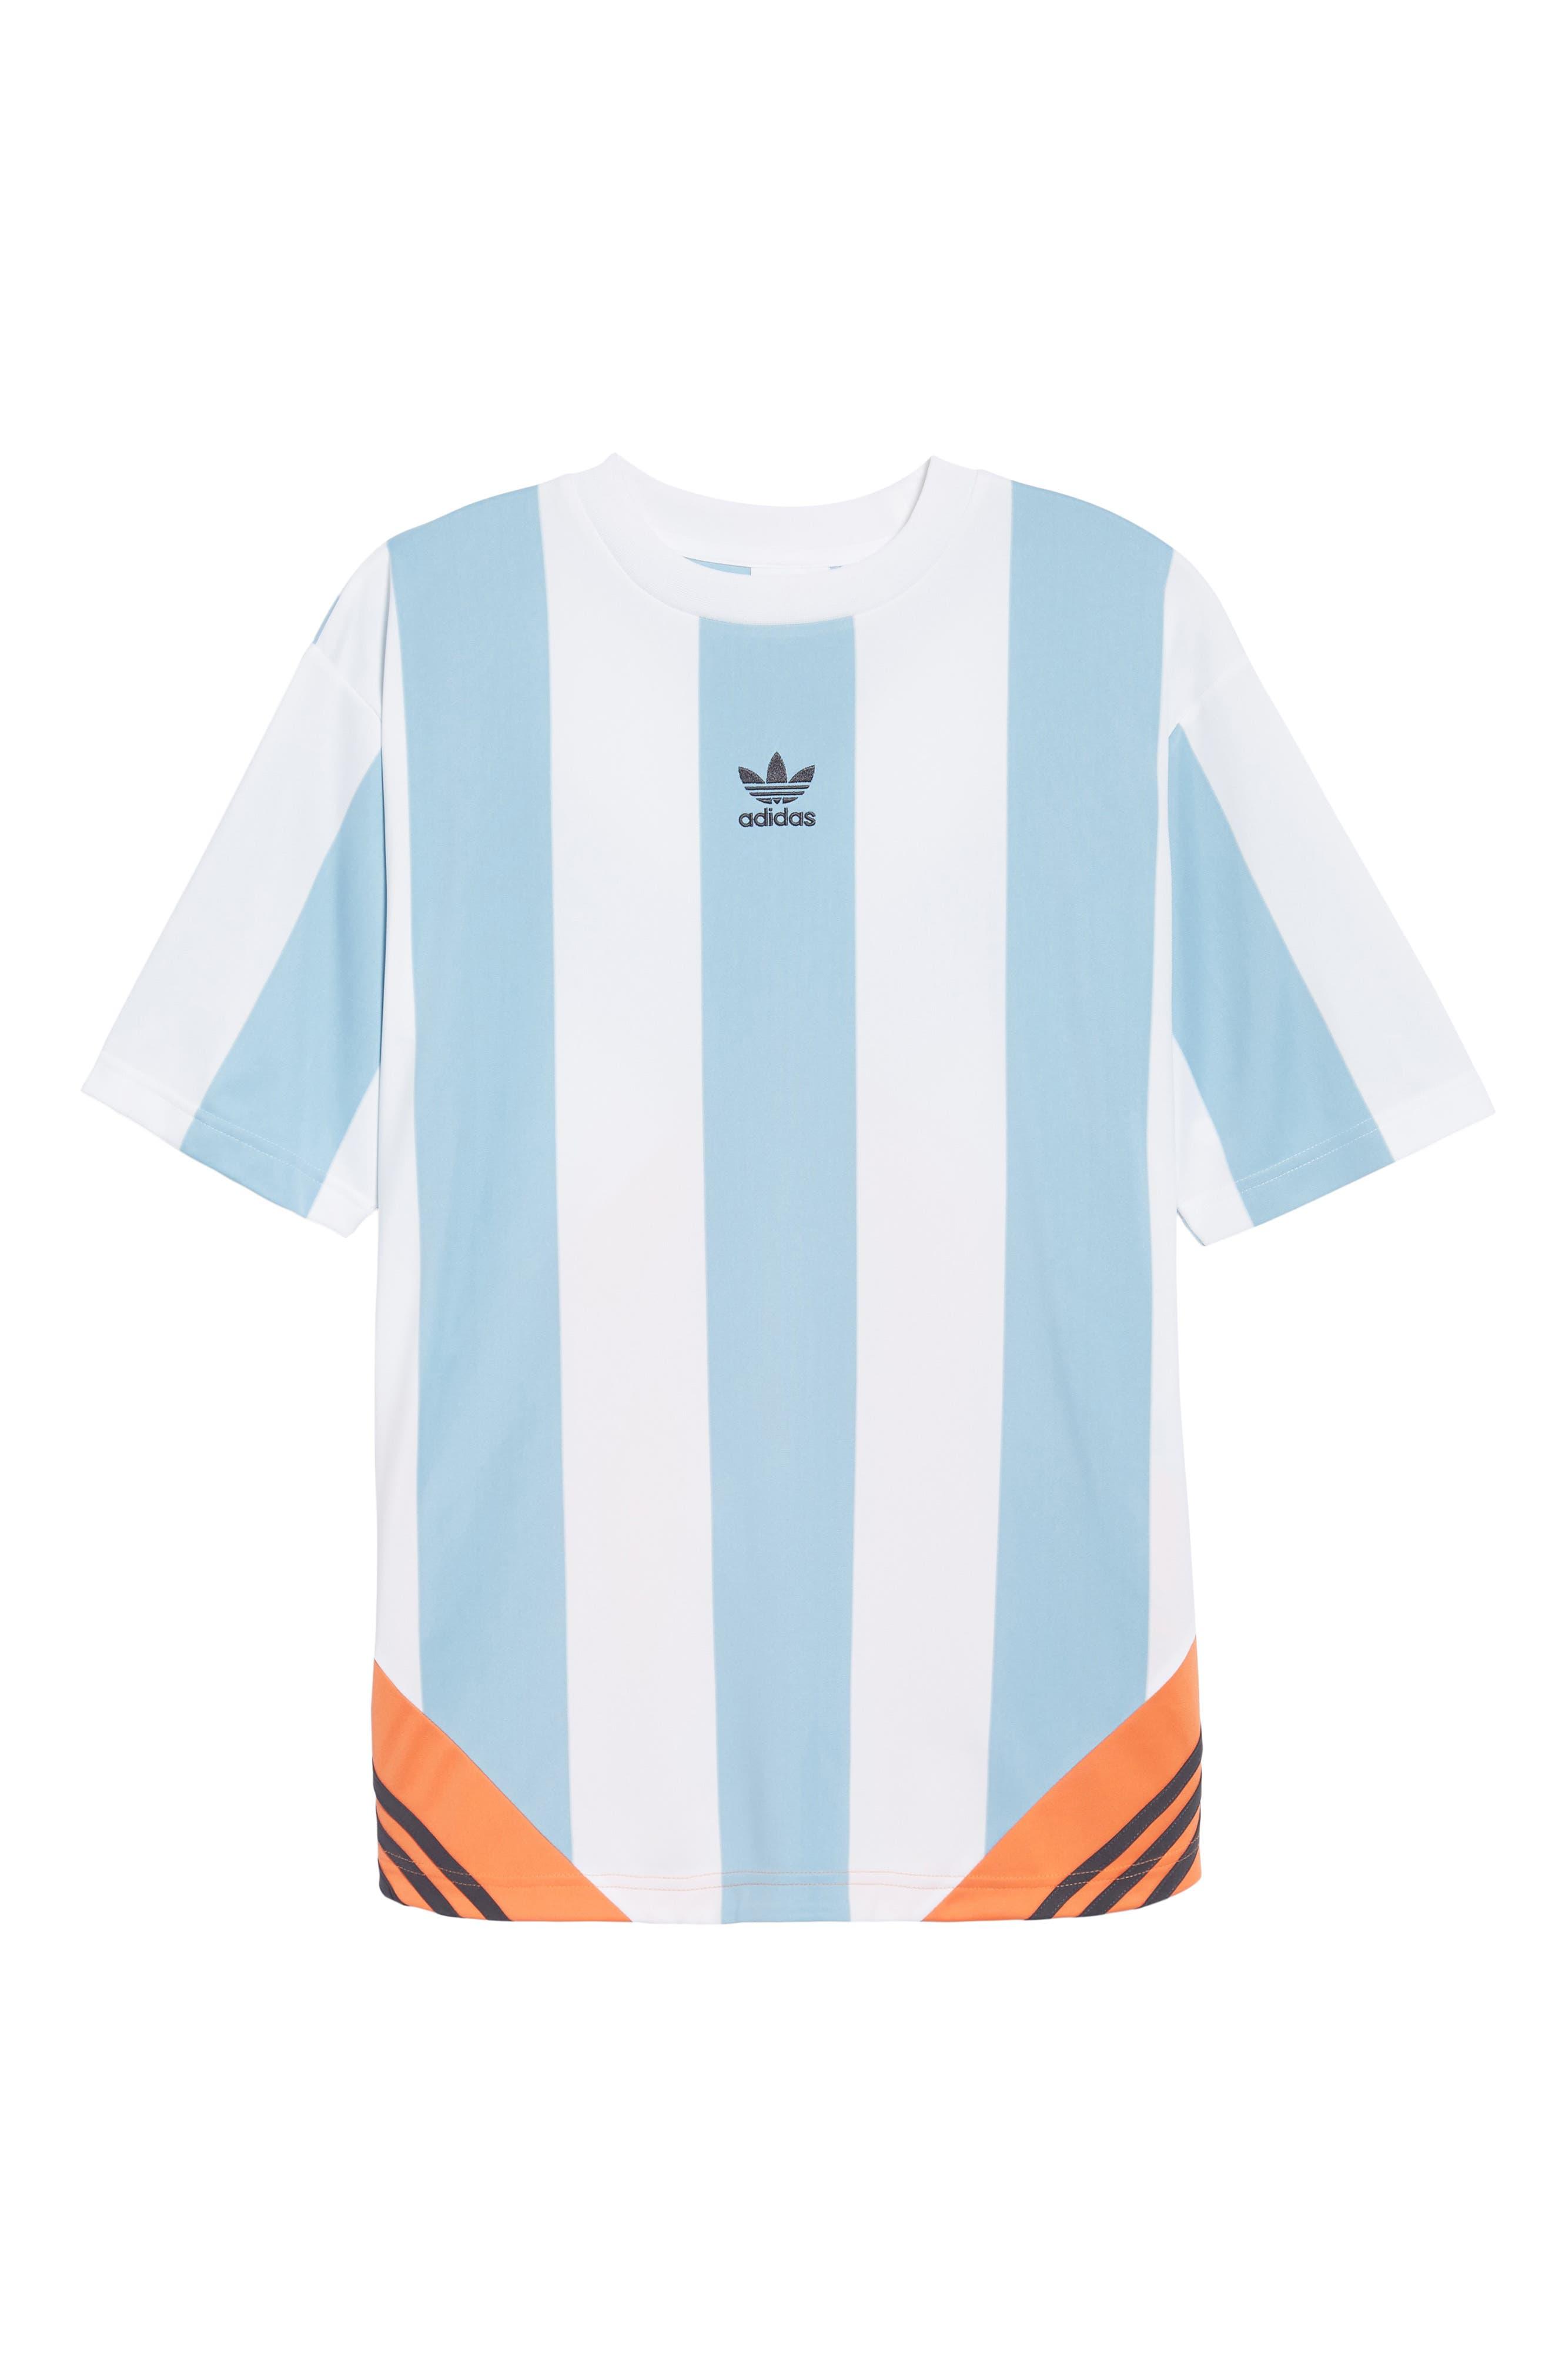 Originals Rival Goalie T-Shirt,                             Alternate thumbnail 6, color,                             059